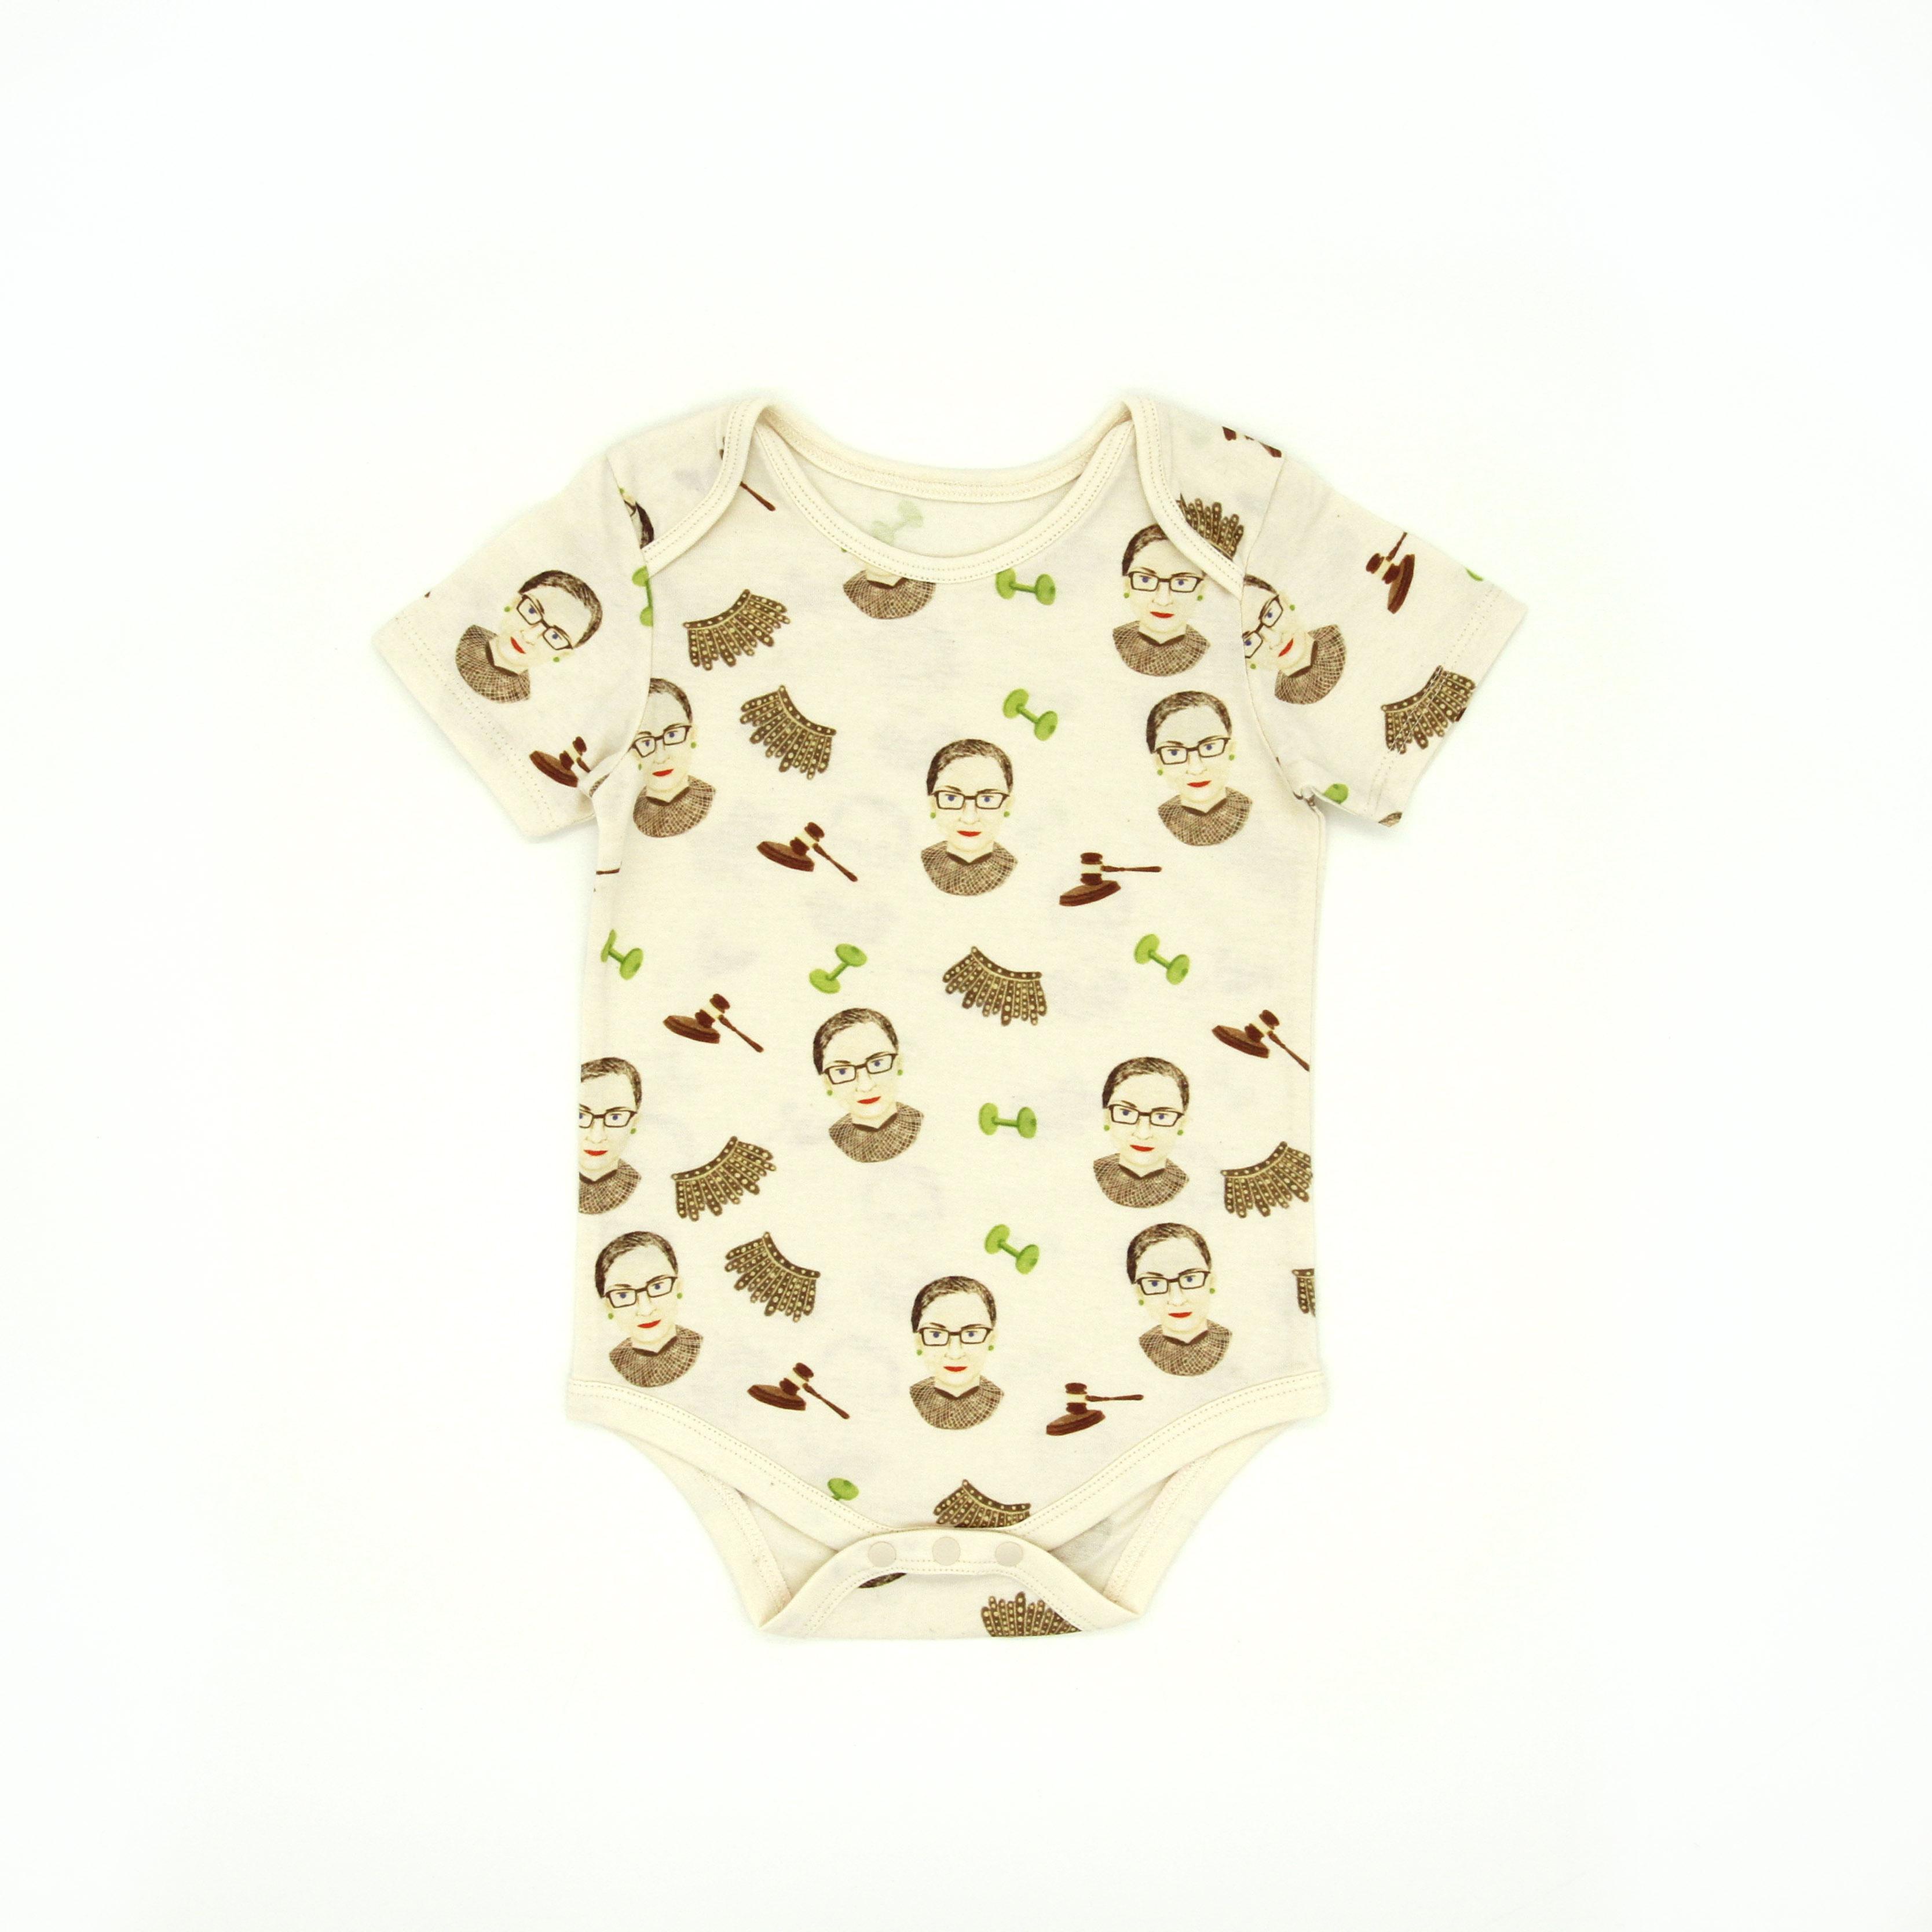 Ruth Bader Ginsburg baby onesie